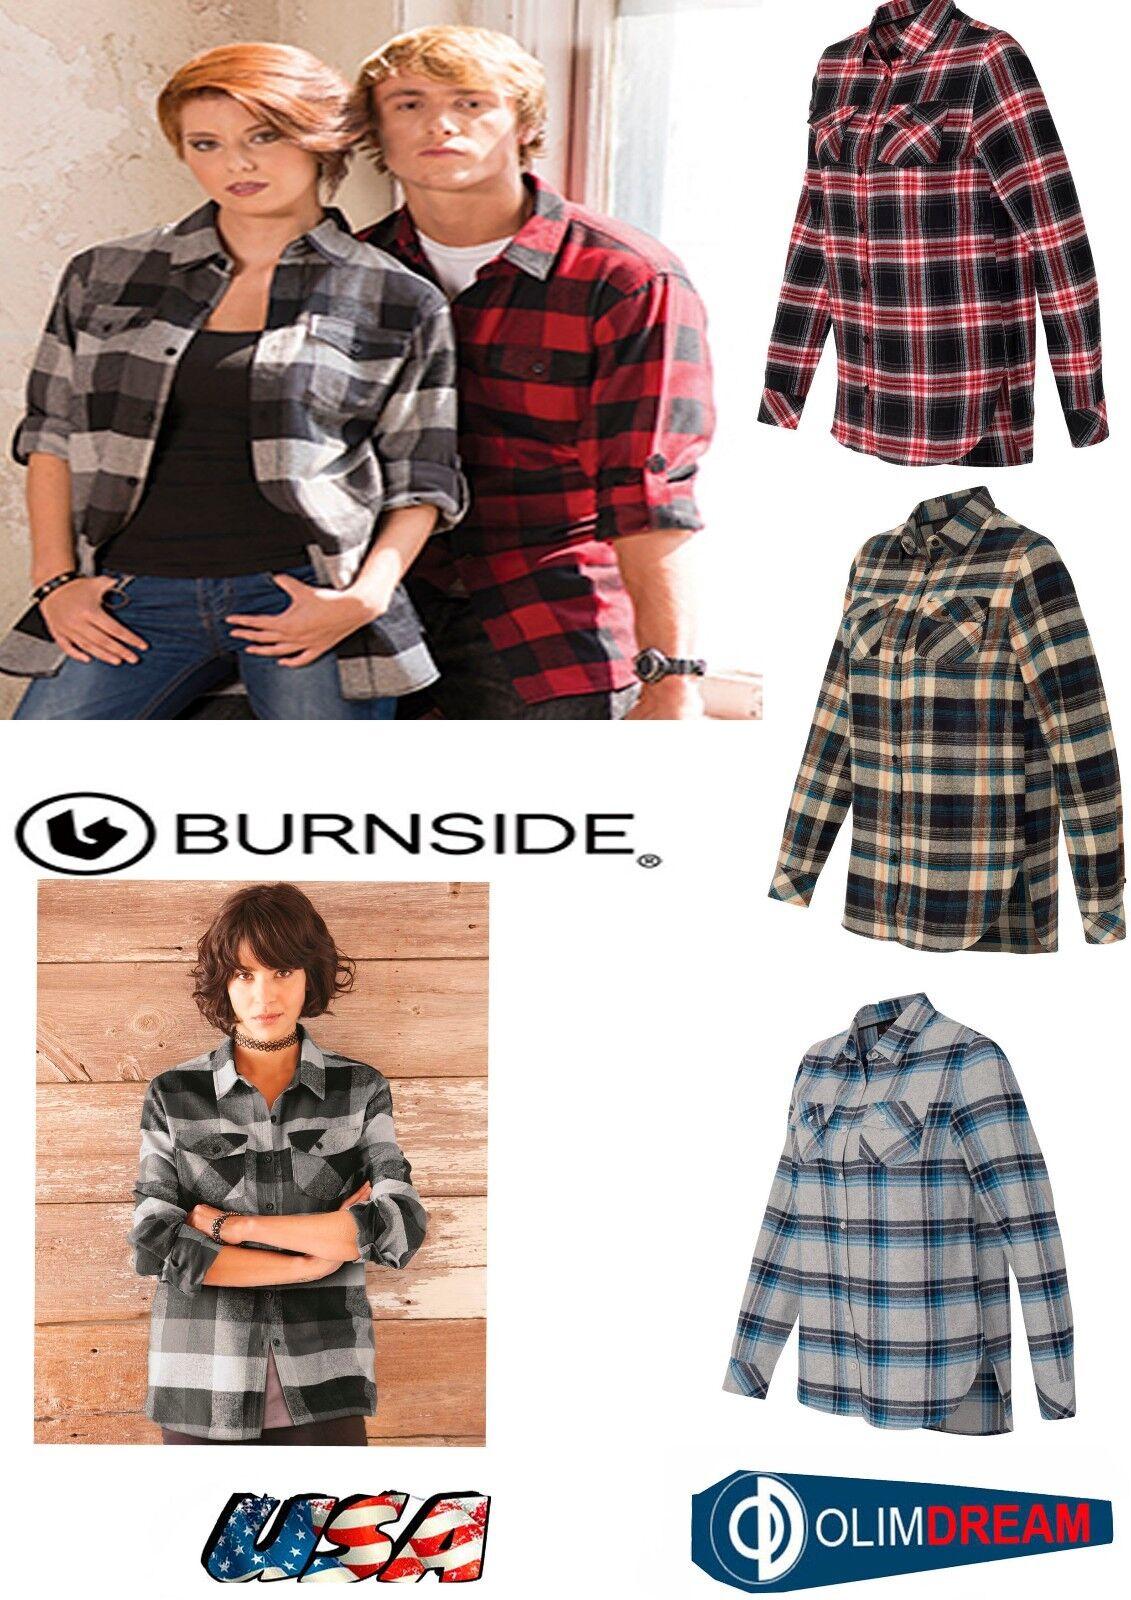 Burnside - Women's Yarn-Dyed Long Sleeve Flannel Shirt - 521